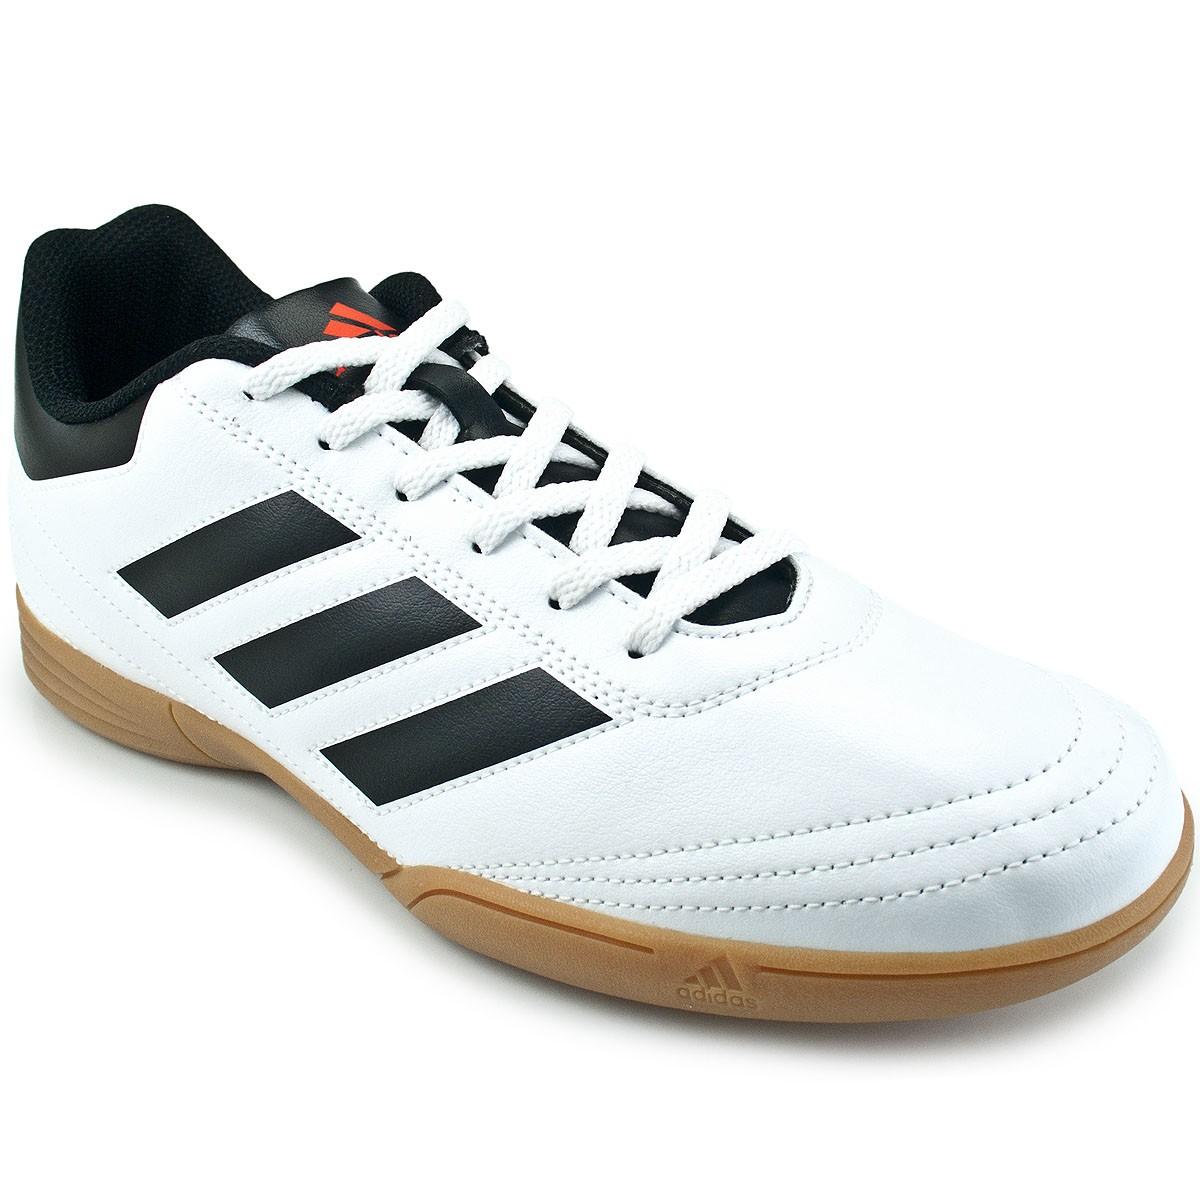 d015251bd2 Chuteira Adidas Goletto 6 IN